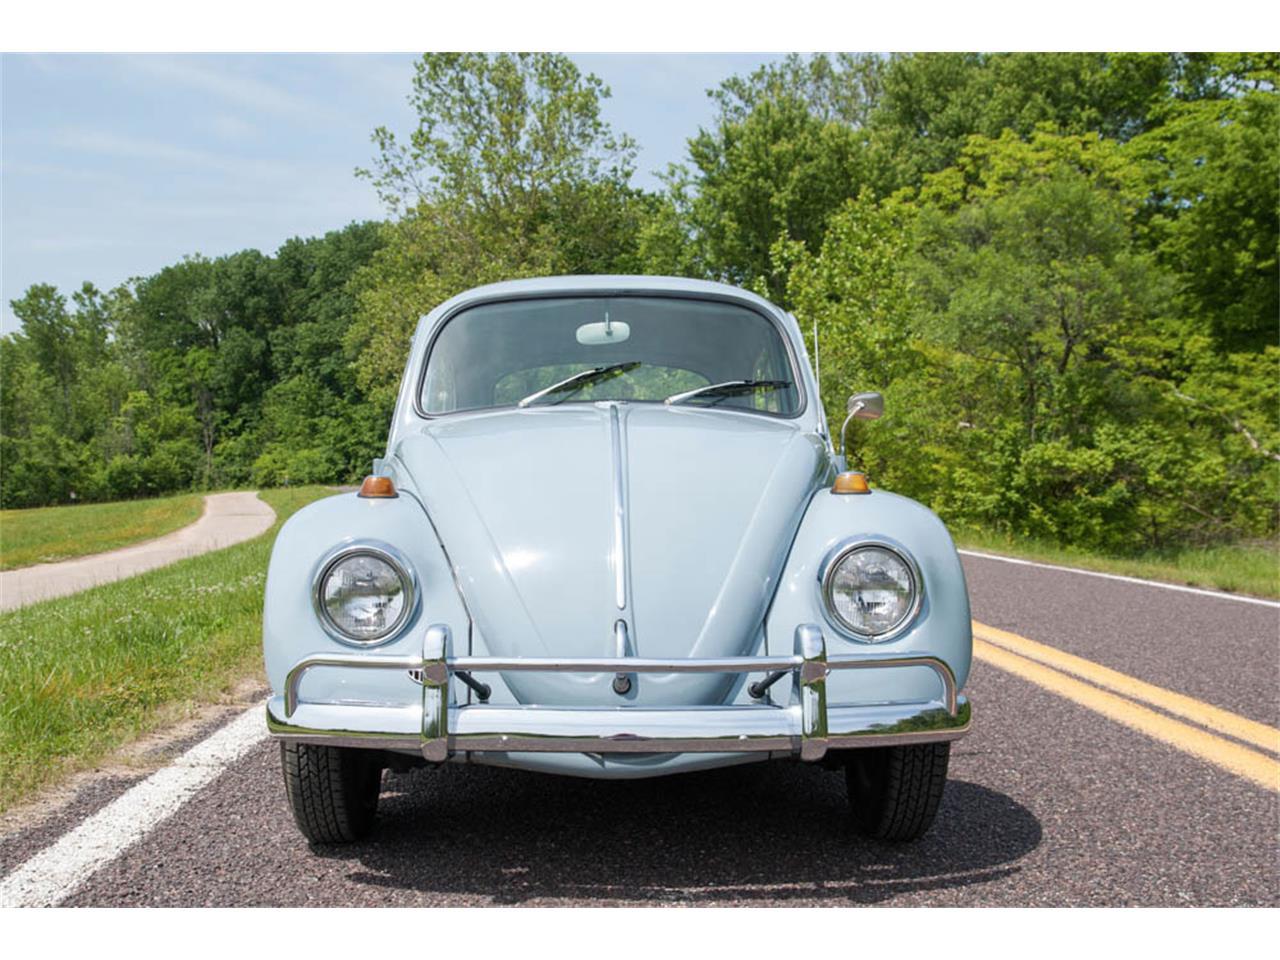 1967 Volkswagen Beetle For Sale Classiccars Com Cc 1052509